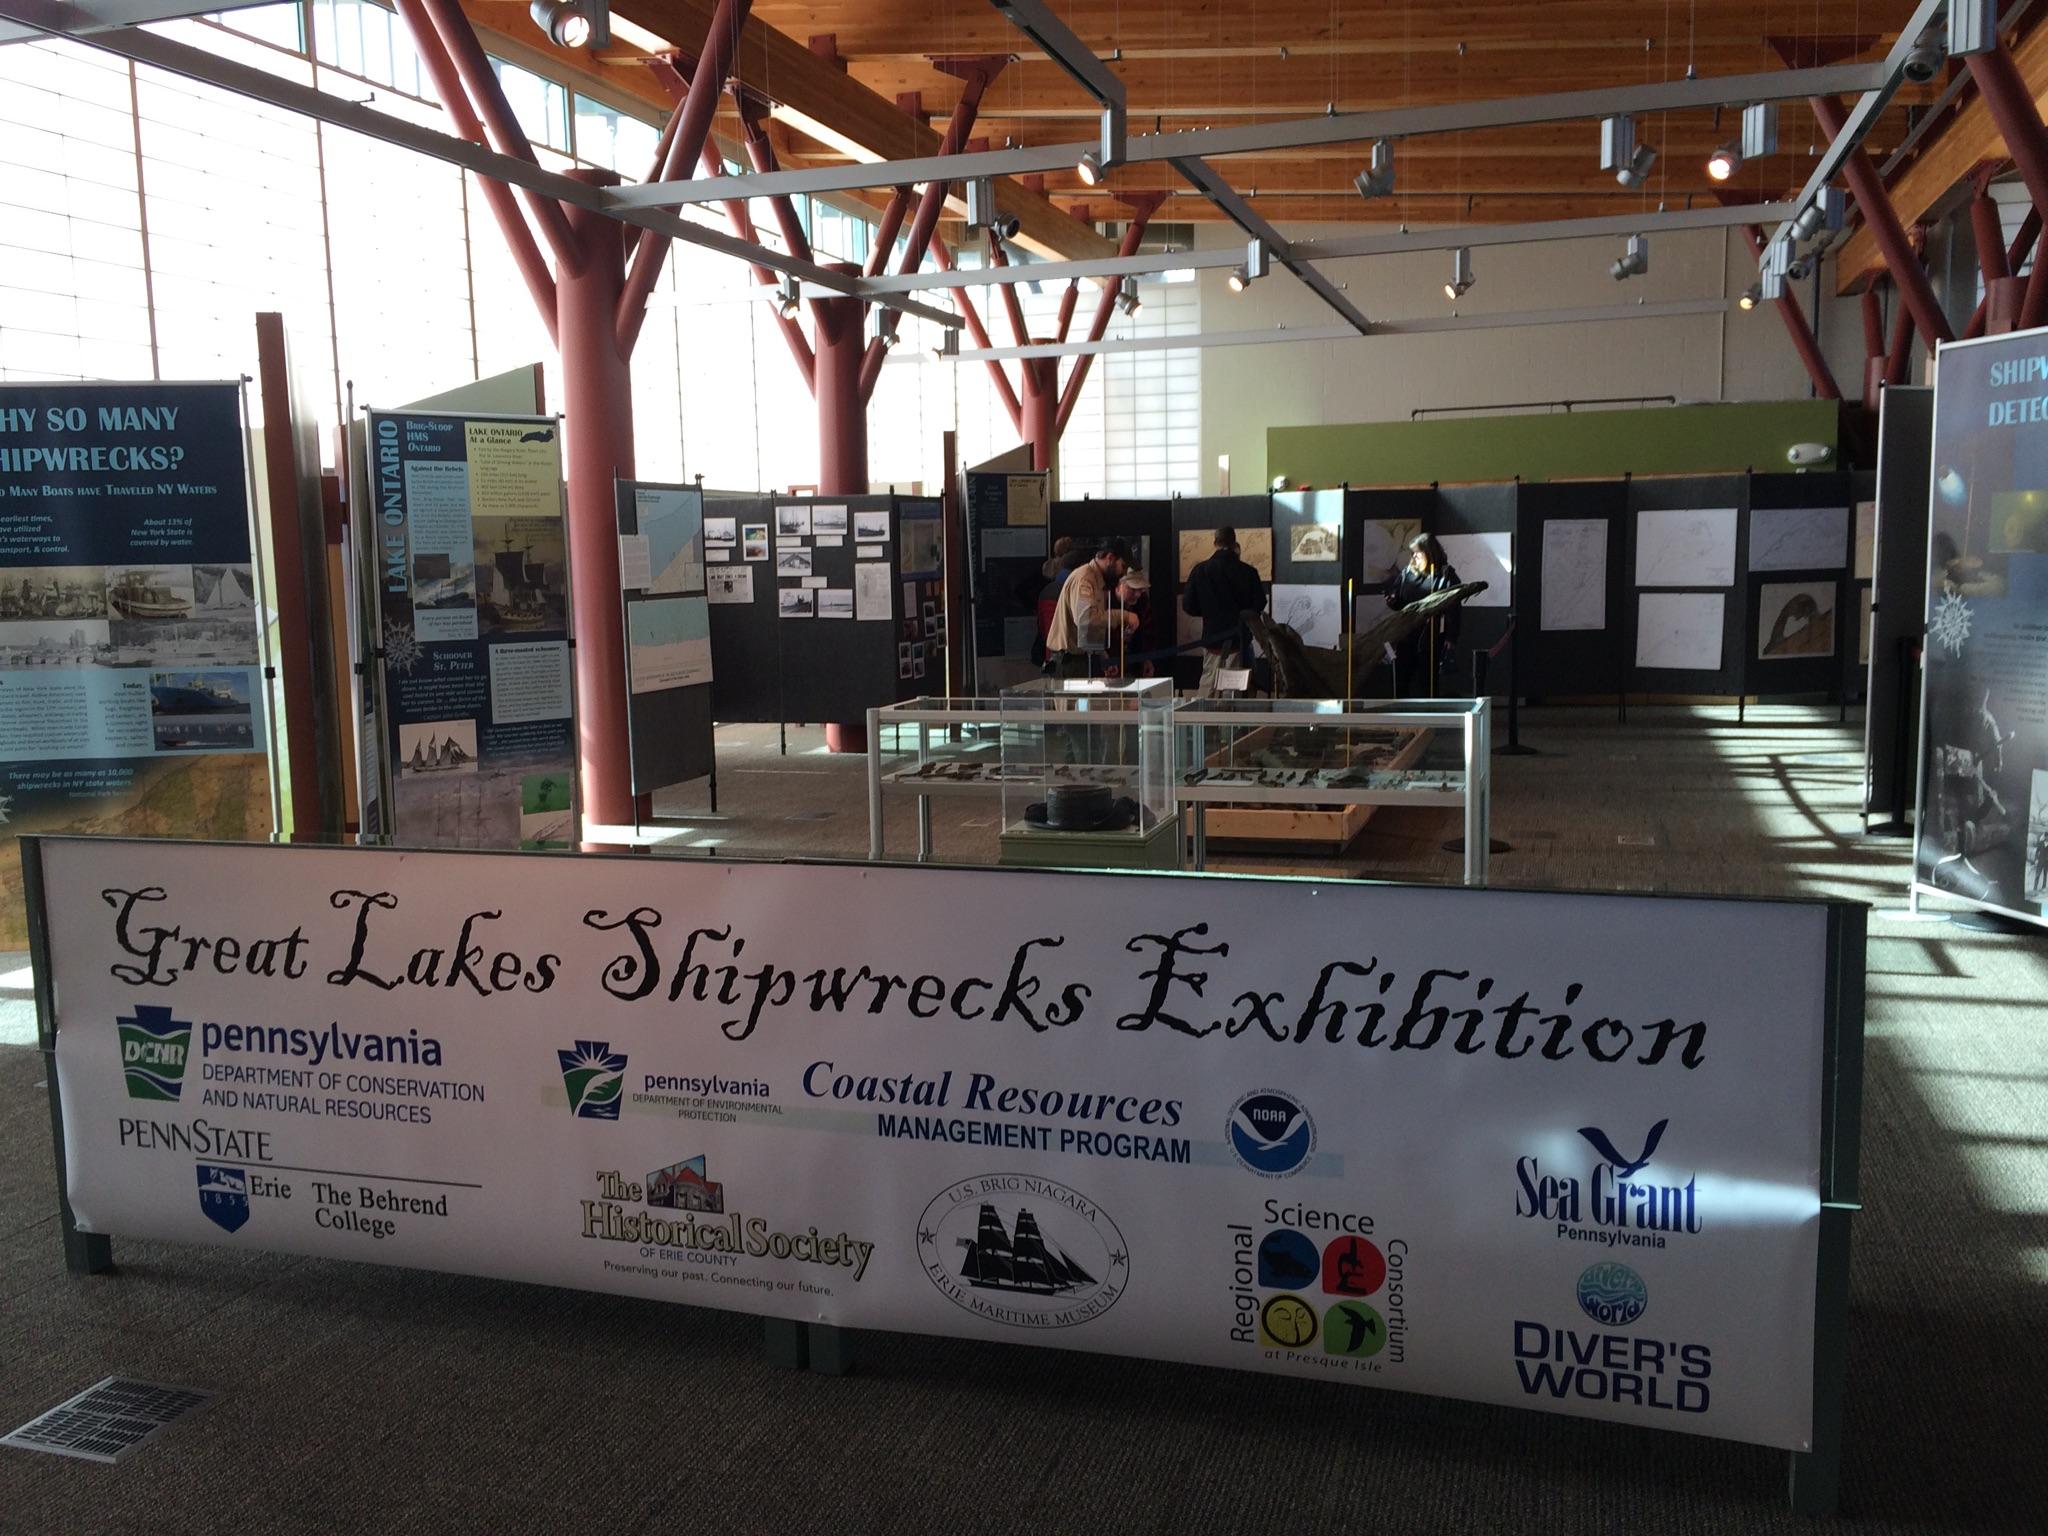 Great Lakes shipwreck exhibit